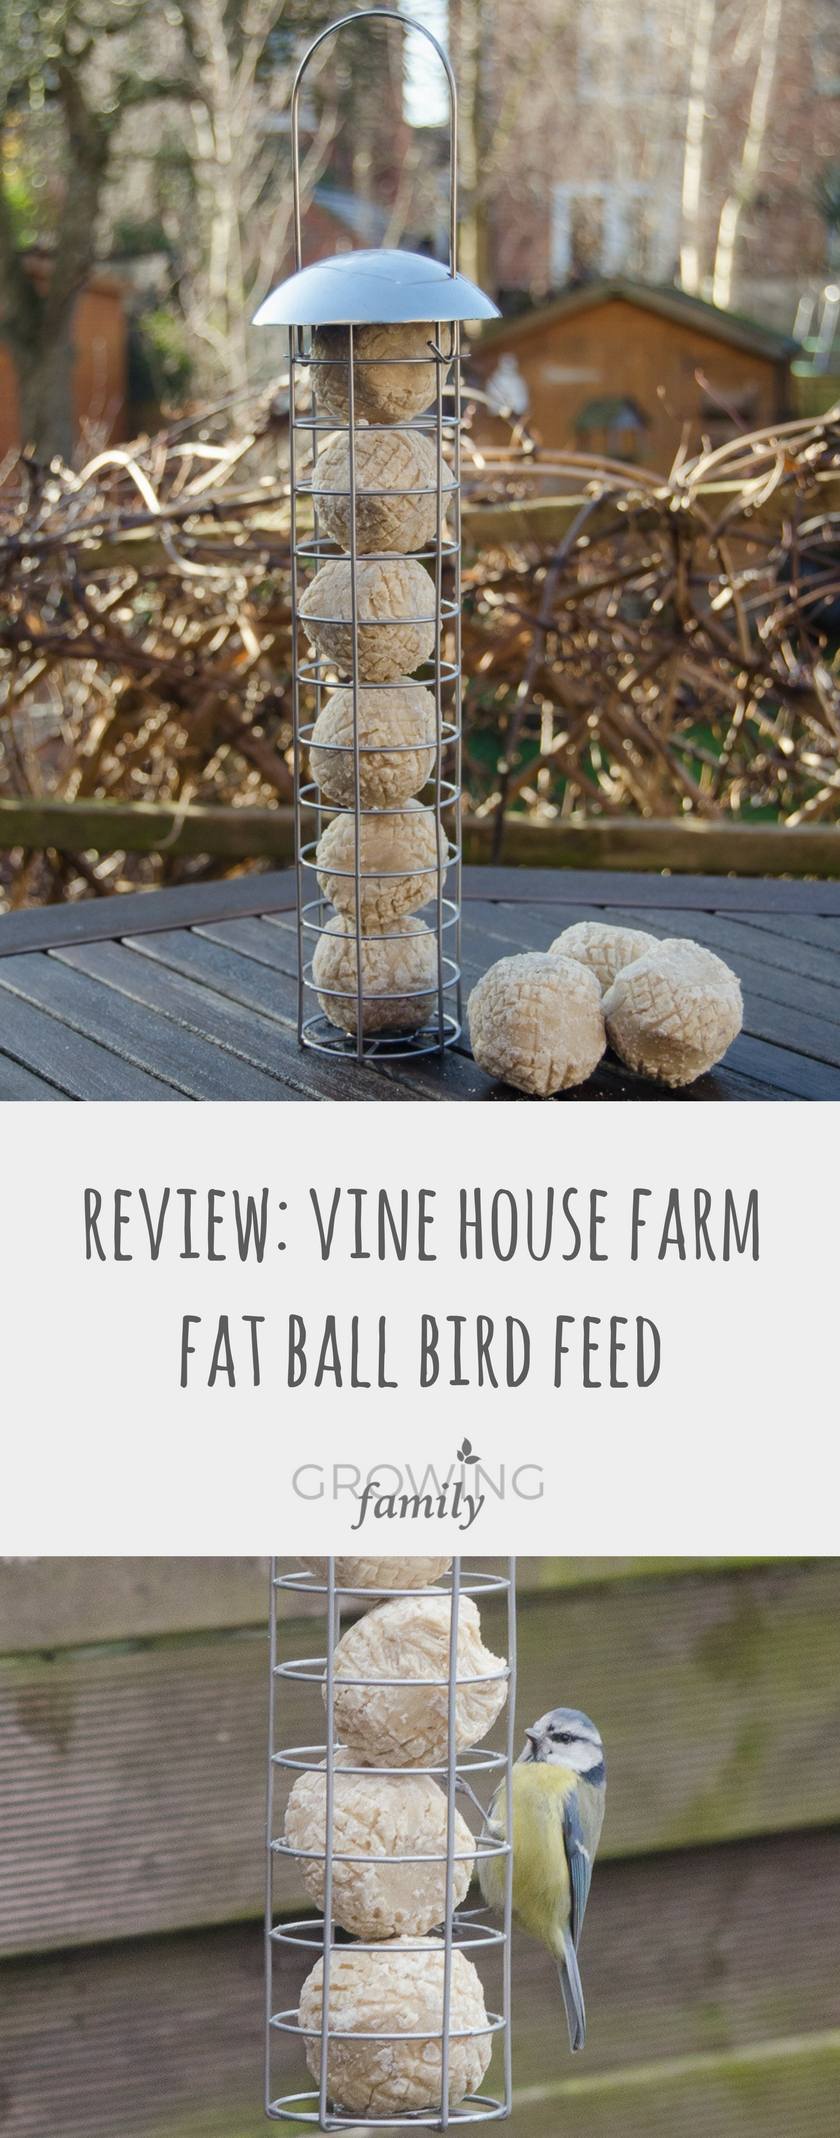 Review Vine House Farm Super Suet Fat Ball Bird Feed Growing Family